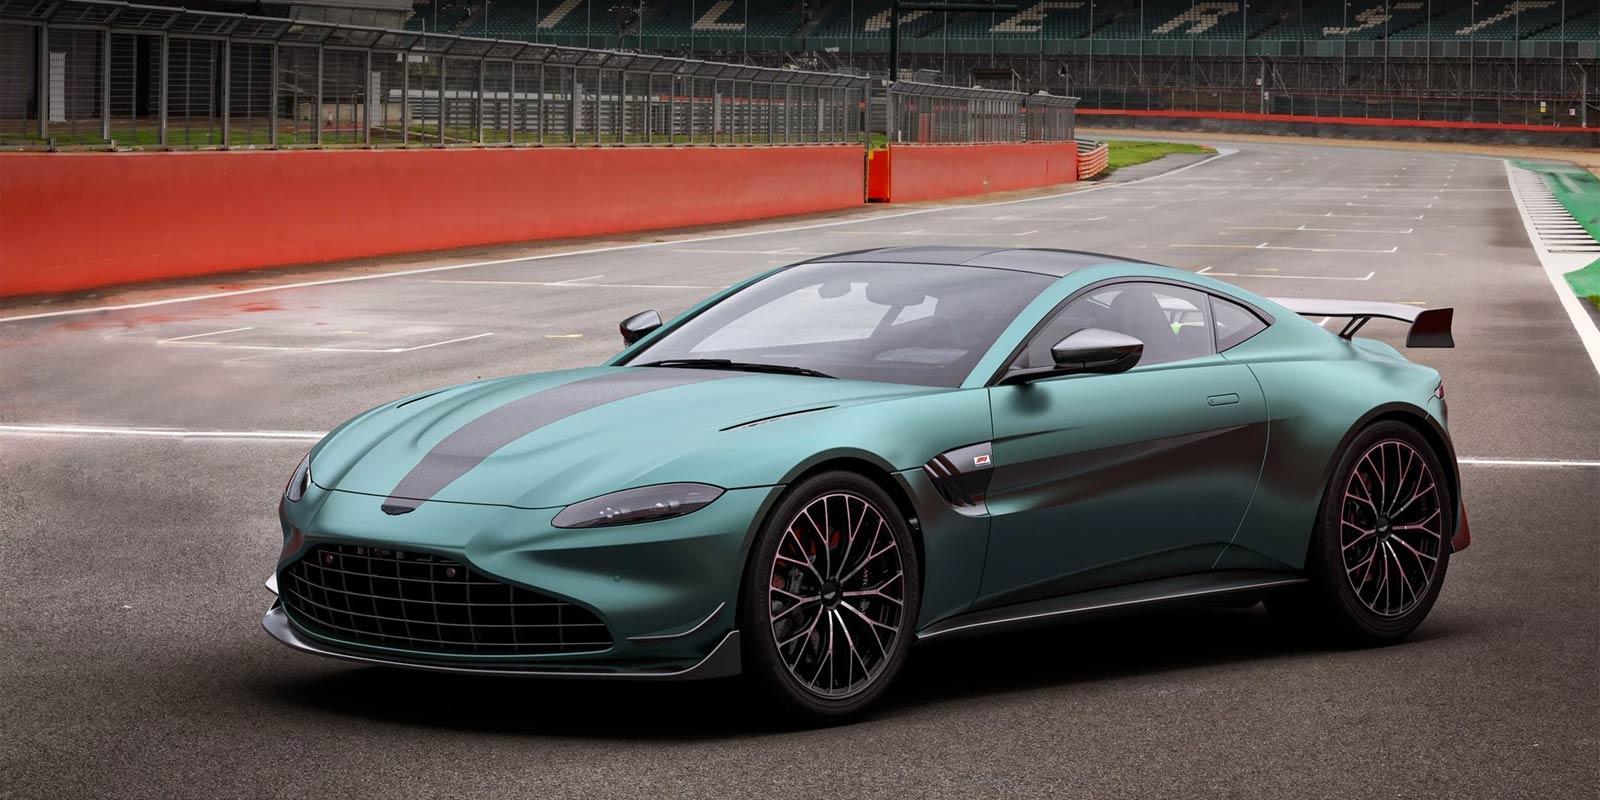 Aston Martin Vantage F1 Edition - A true athlete